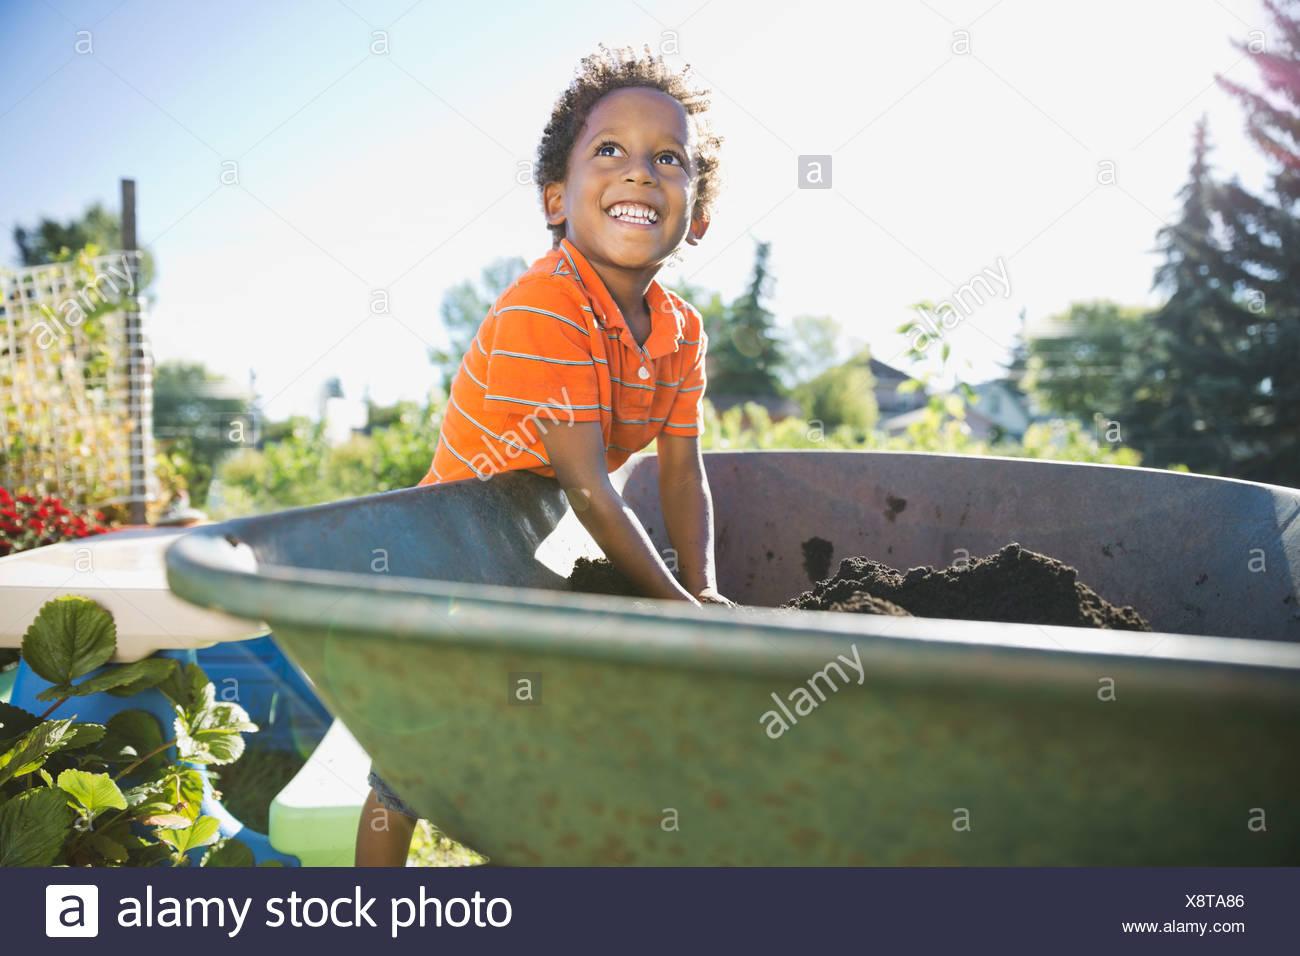 Boy picking up garden dirt in wheelbarrow - Stock Image